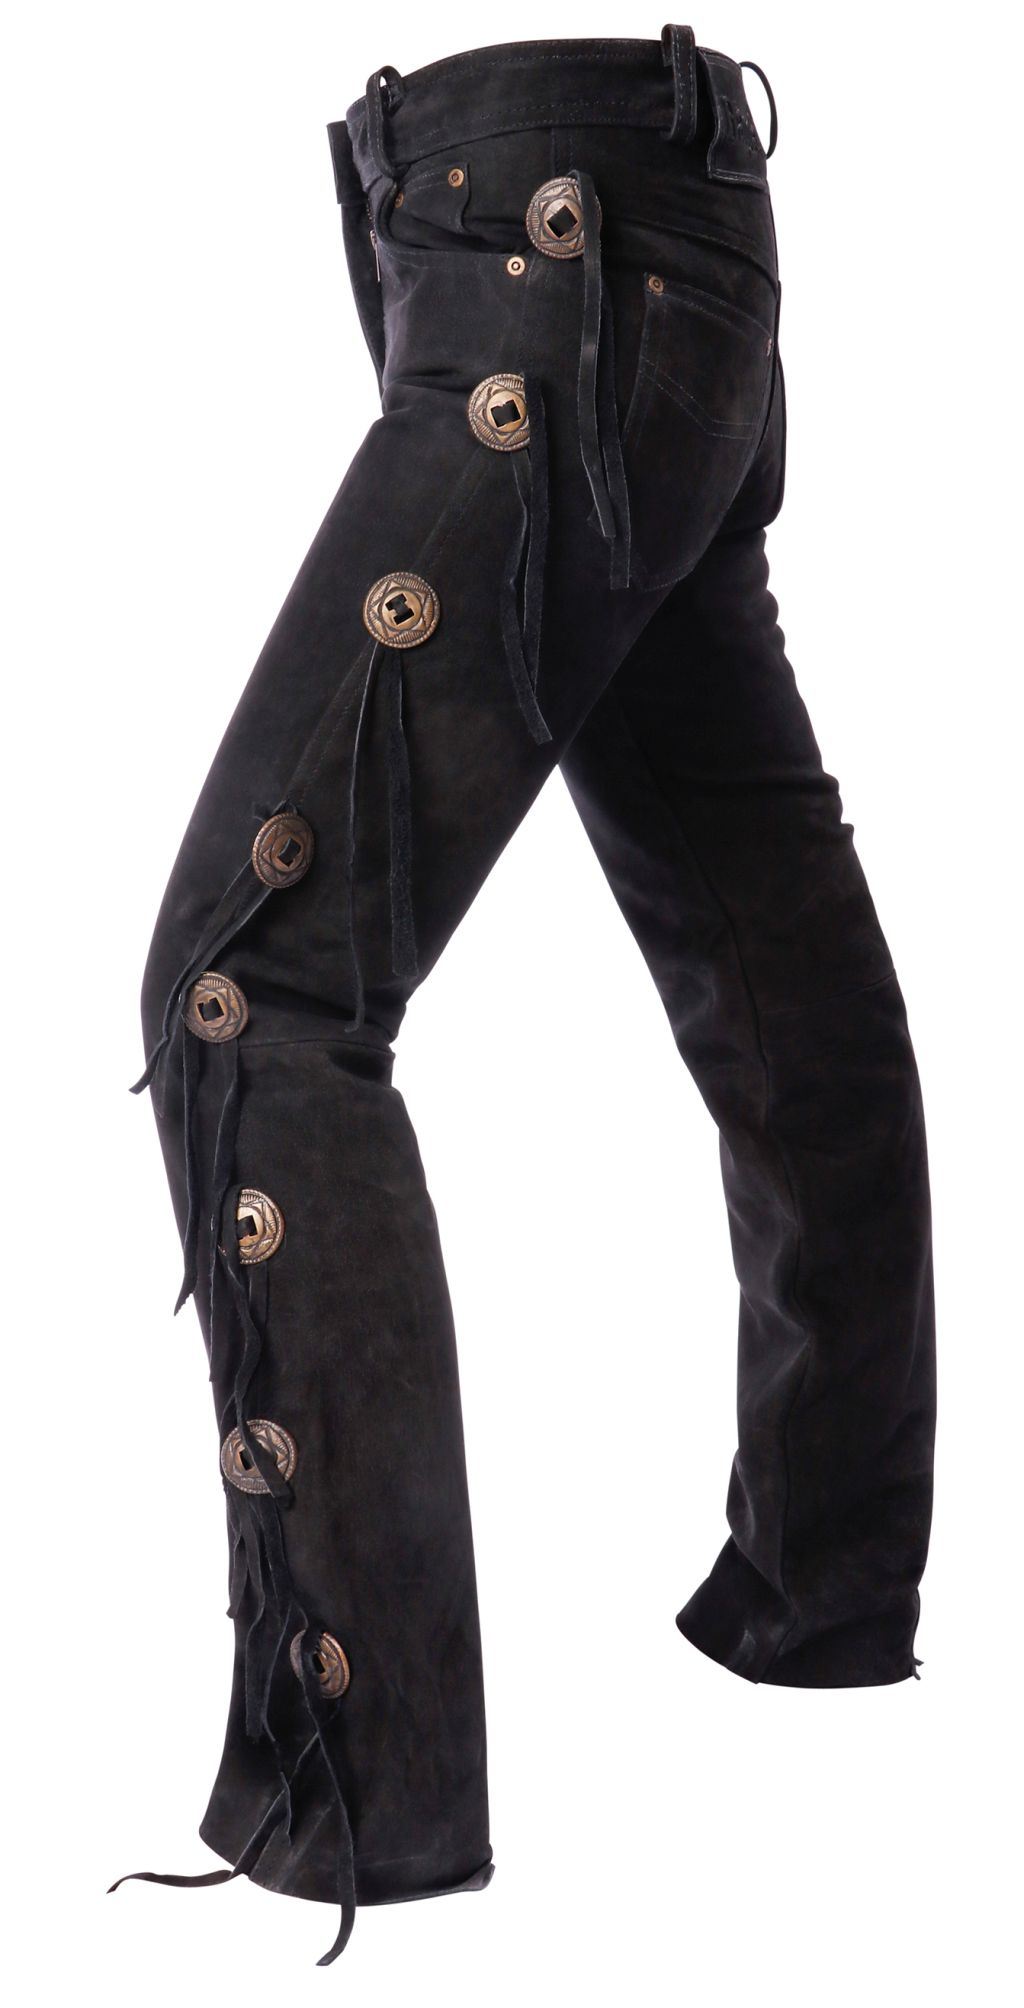 damen nubuk jeans conchos lederhose westernreiten motorrad. Black Bedroom Furniture Sets. Home Design Ideas